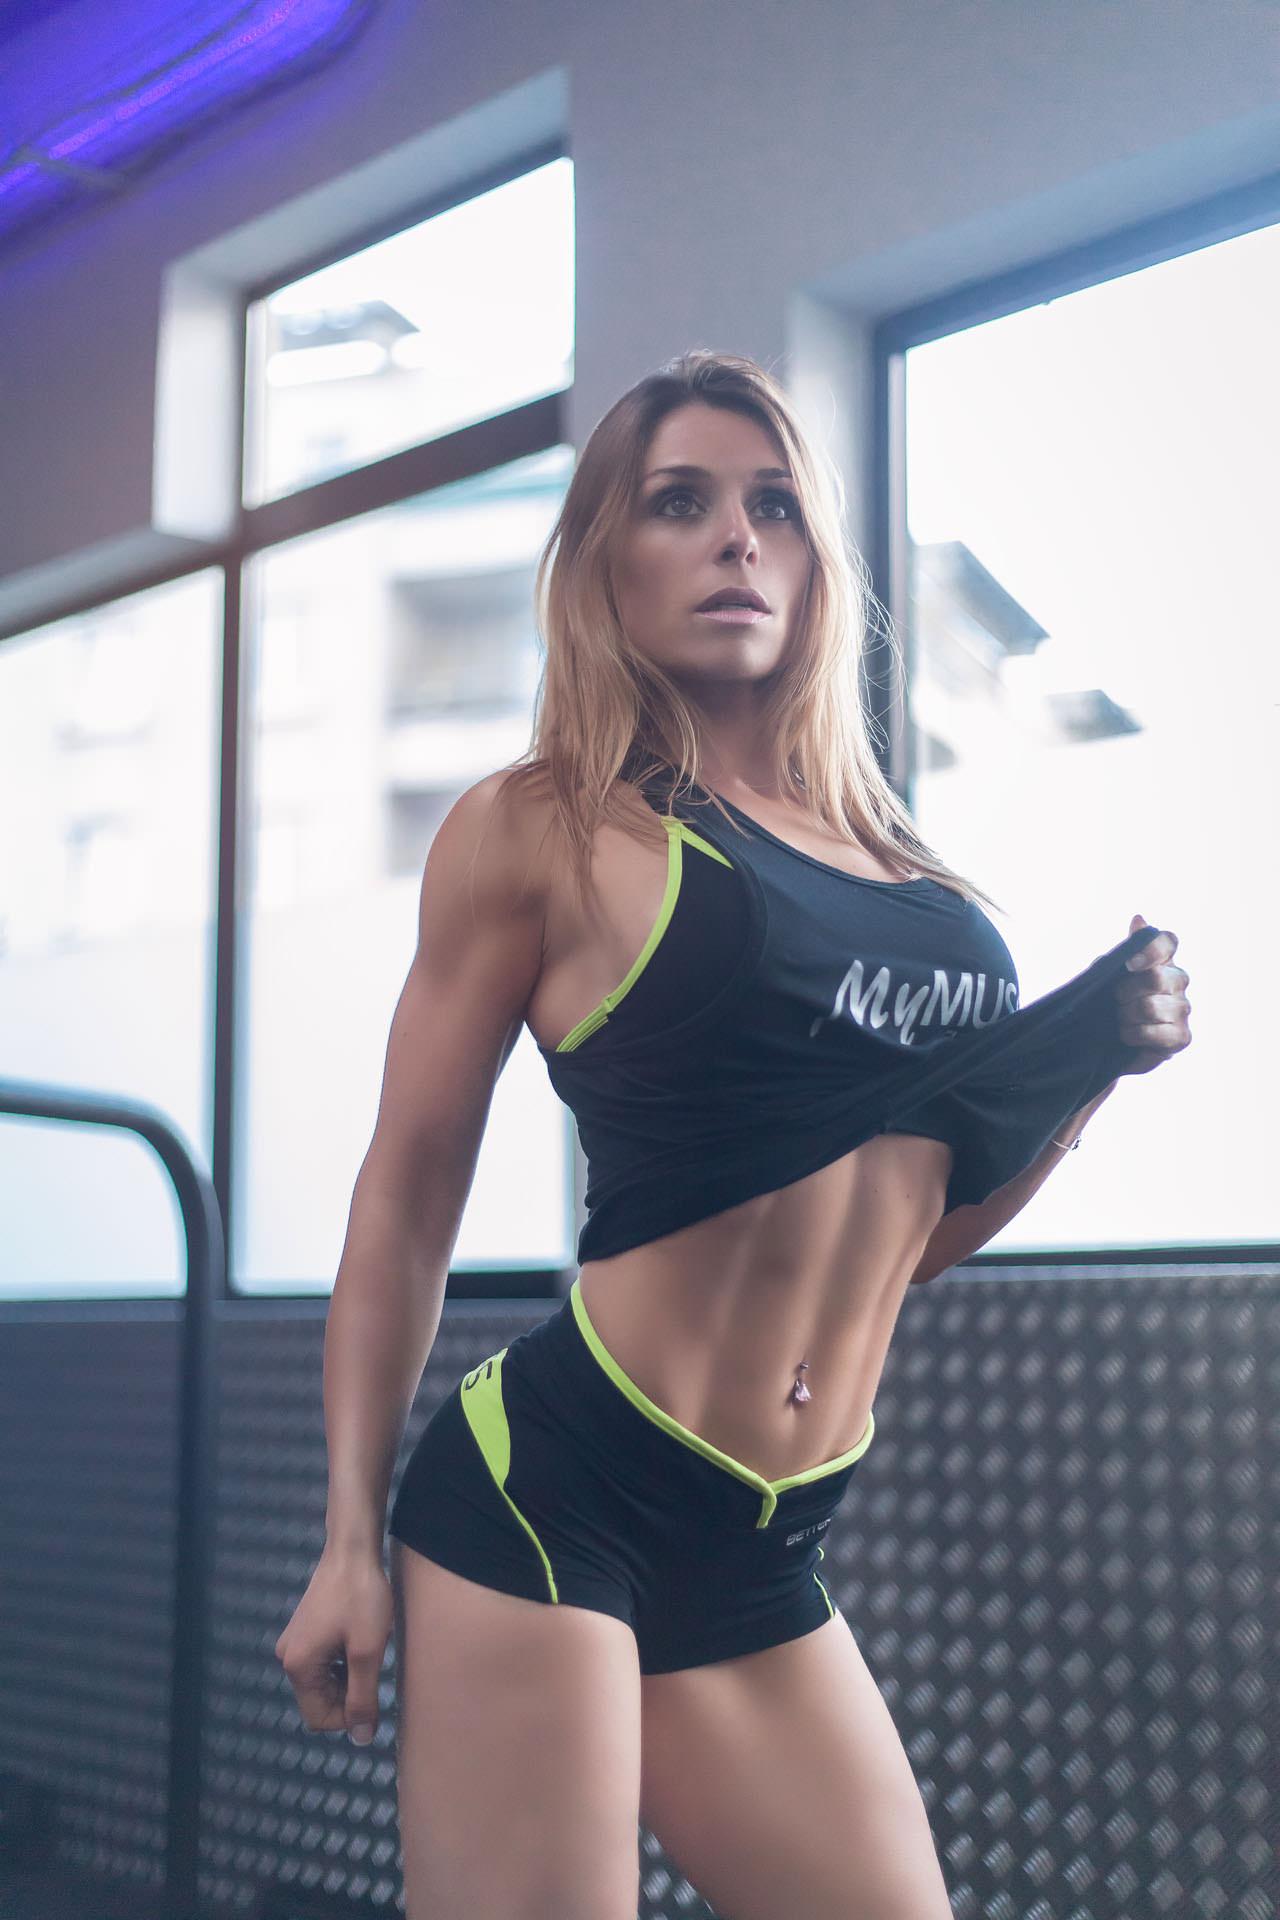 2017-02-24 - Alexandra - MyMuscle - FitnessPark - 3452 - V2 - 1920px